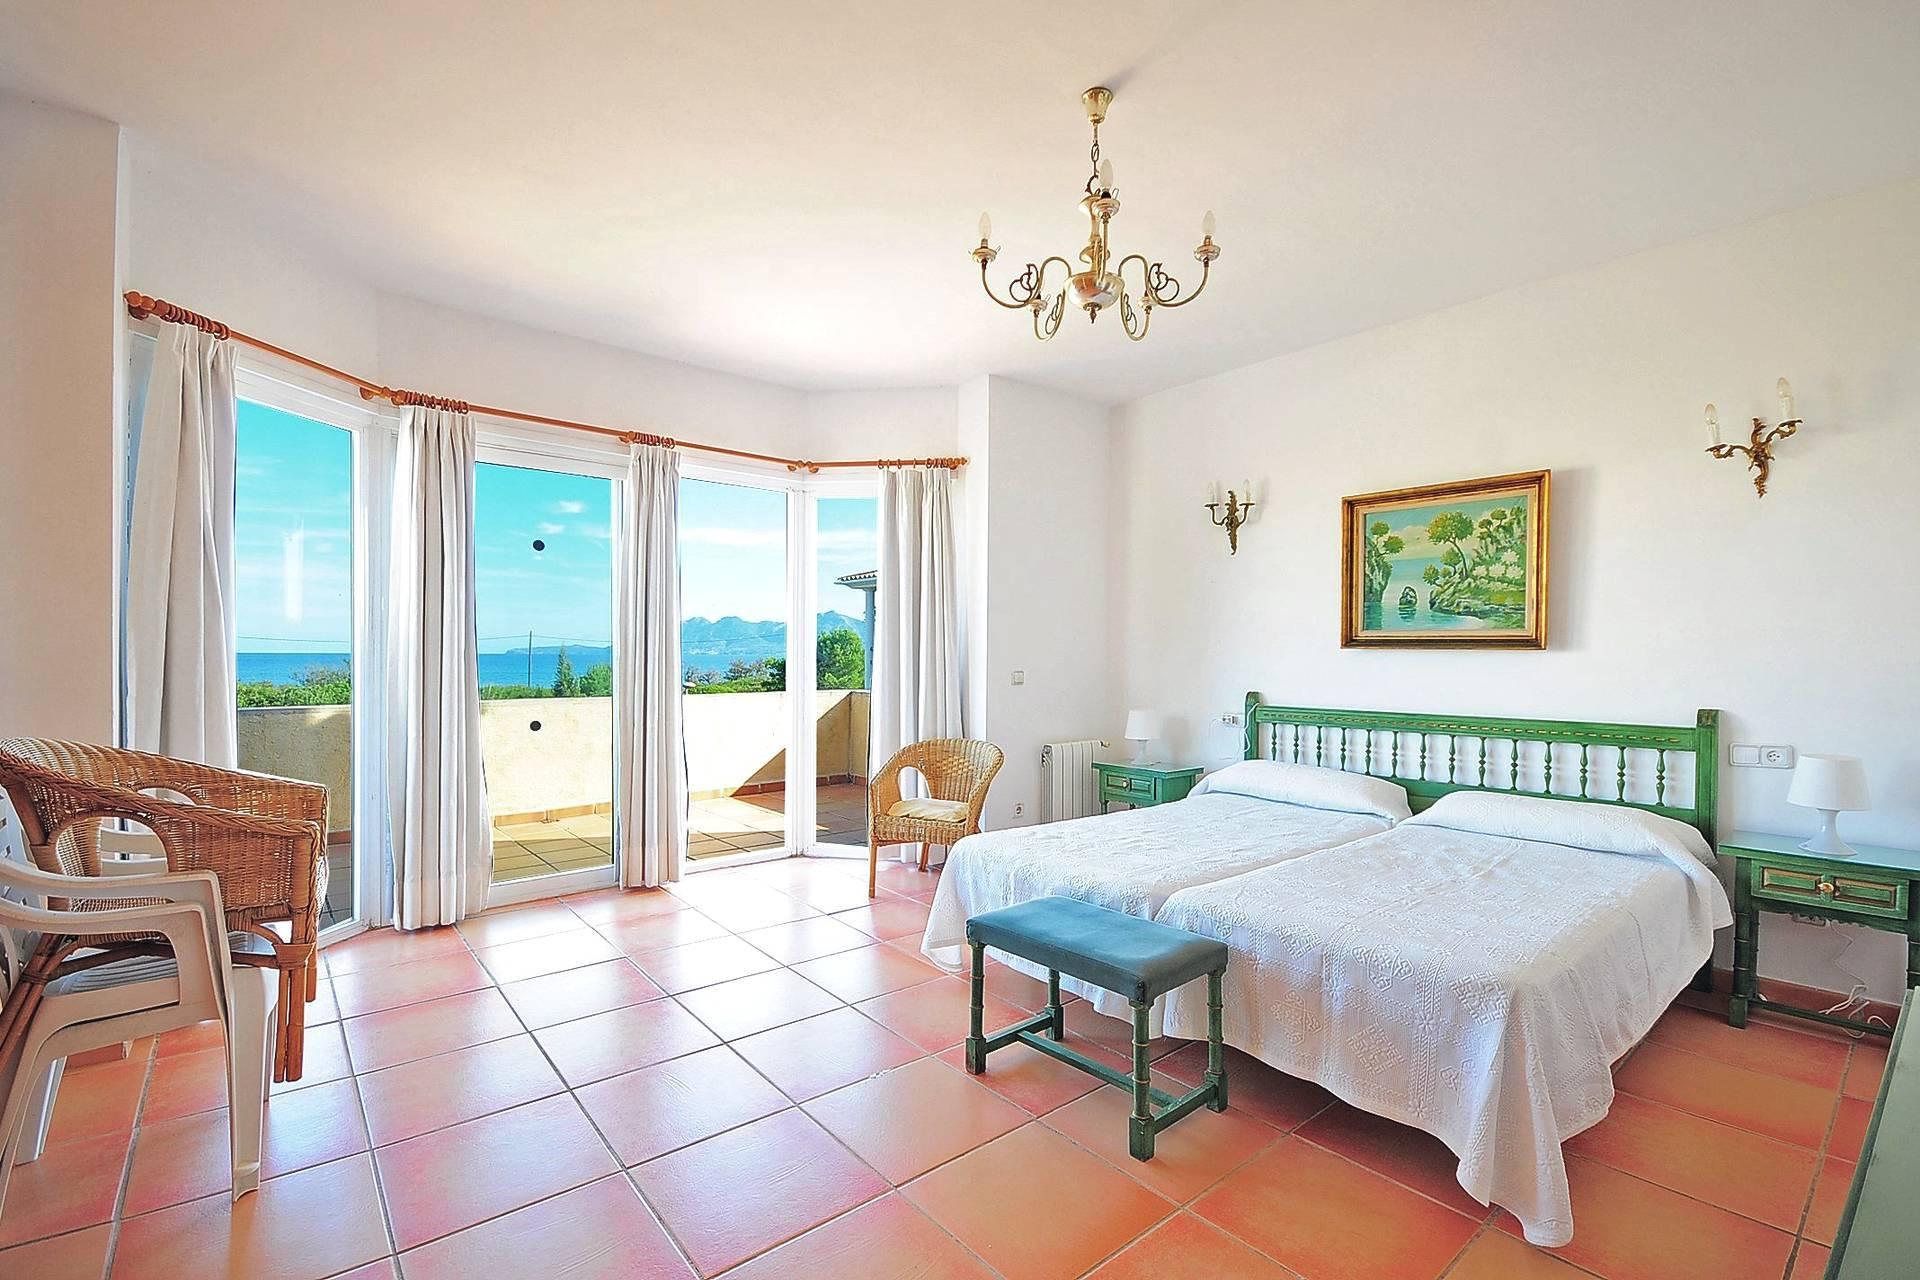 01-233 Ferienhaus am Strand Mallorca Norden Bild 15